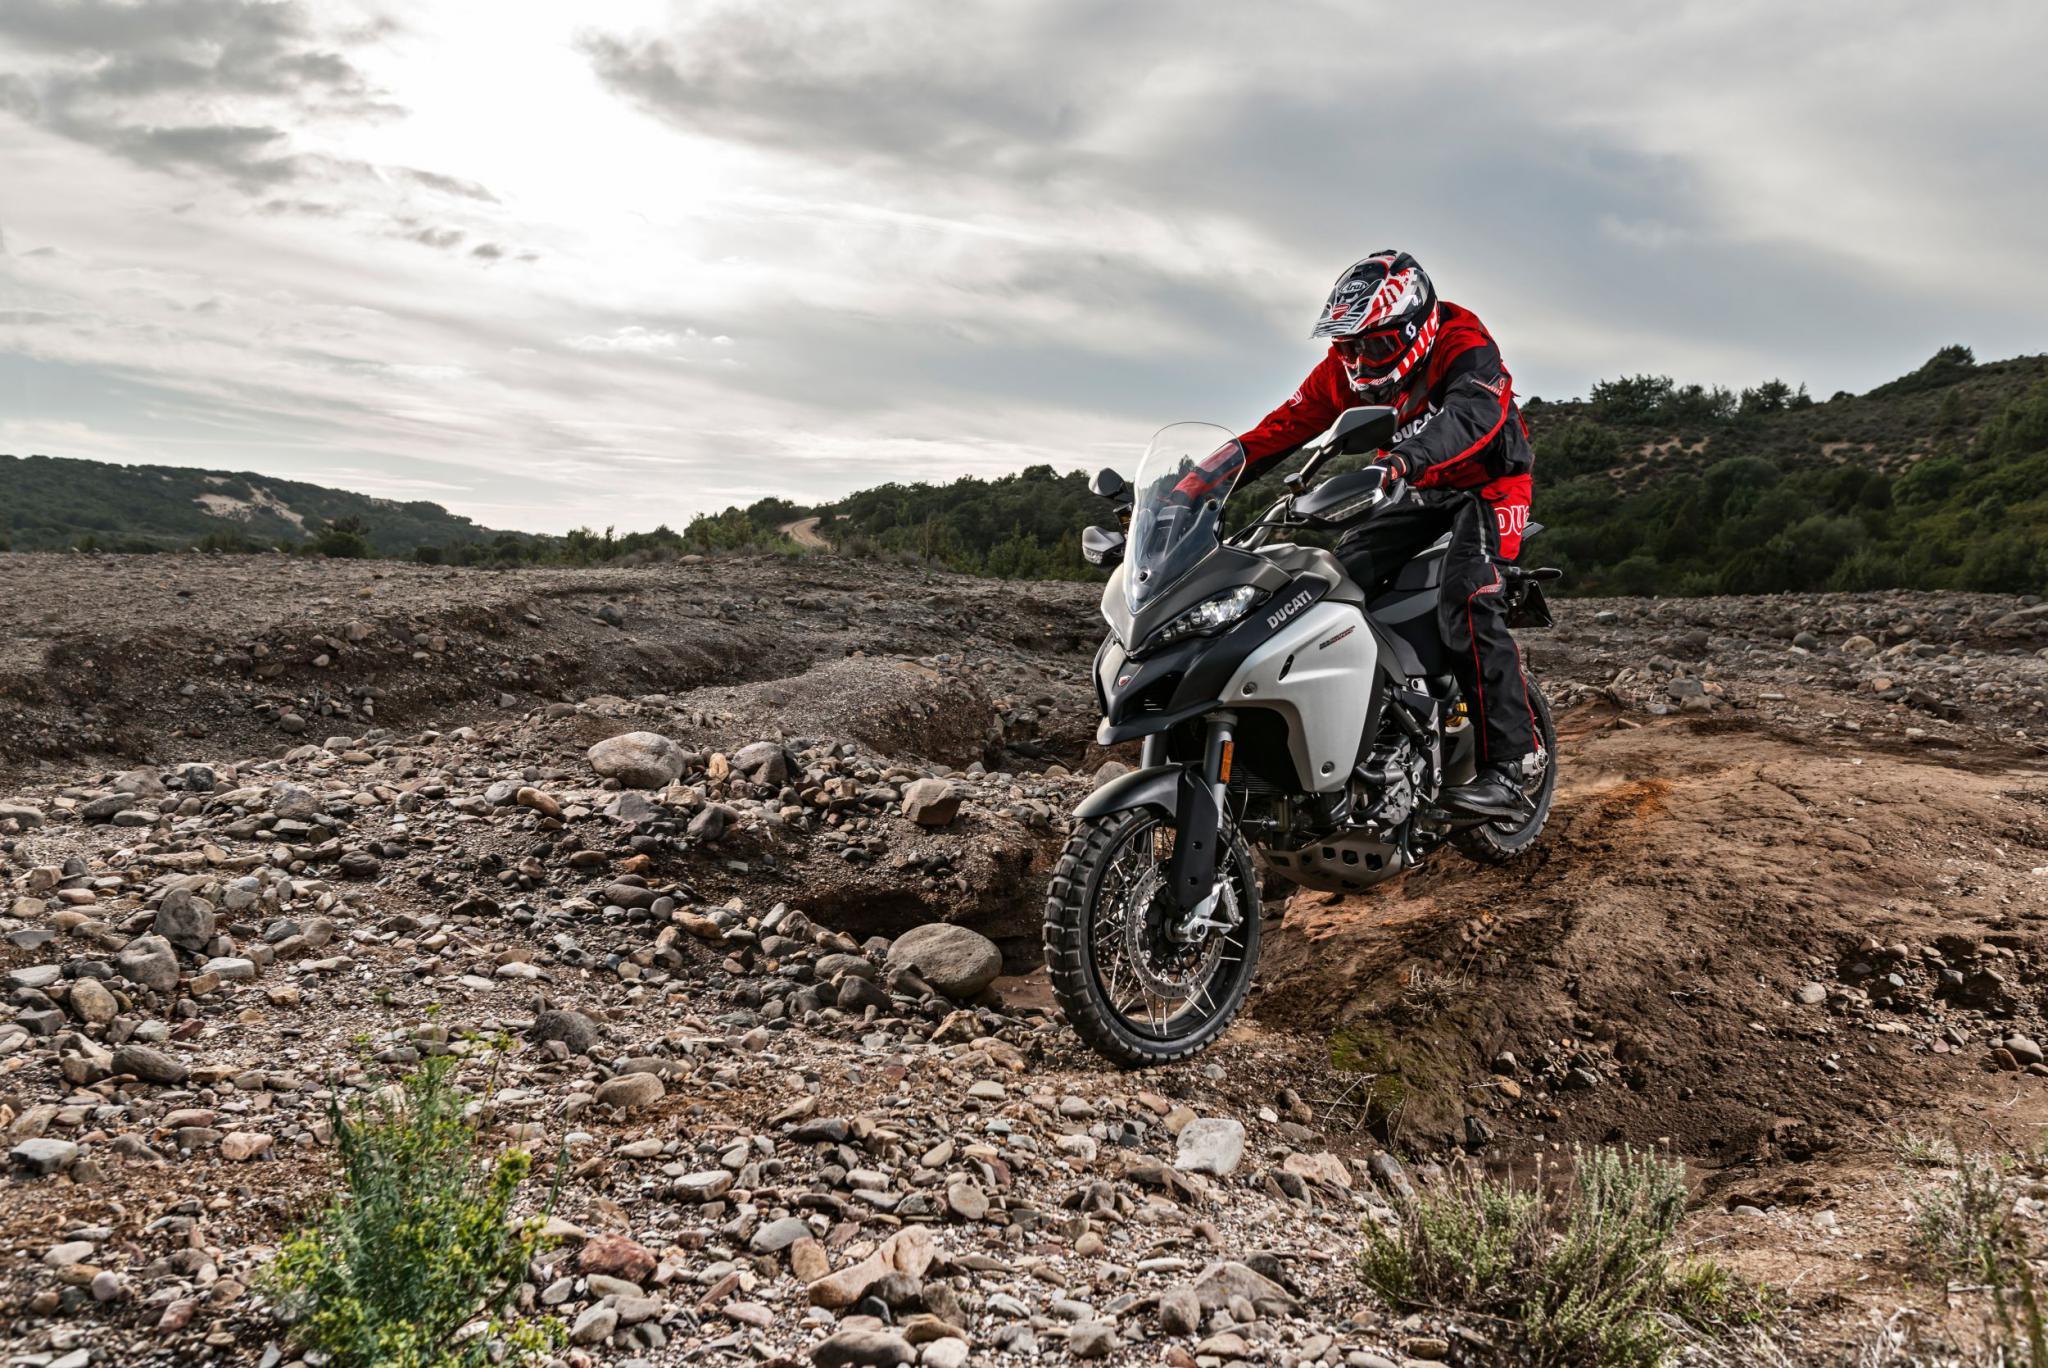 Ducati Multistrada Touring Pack Price